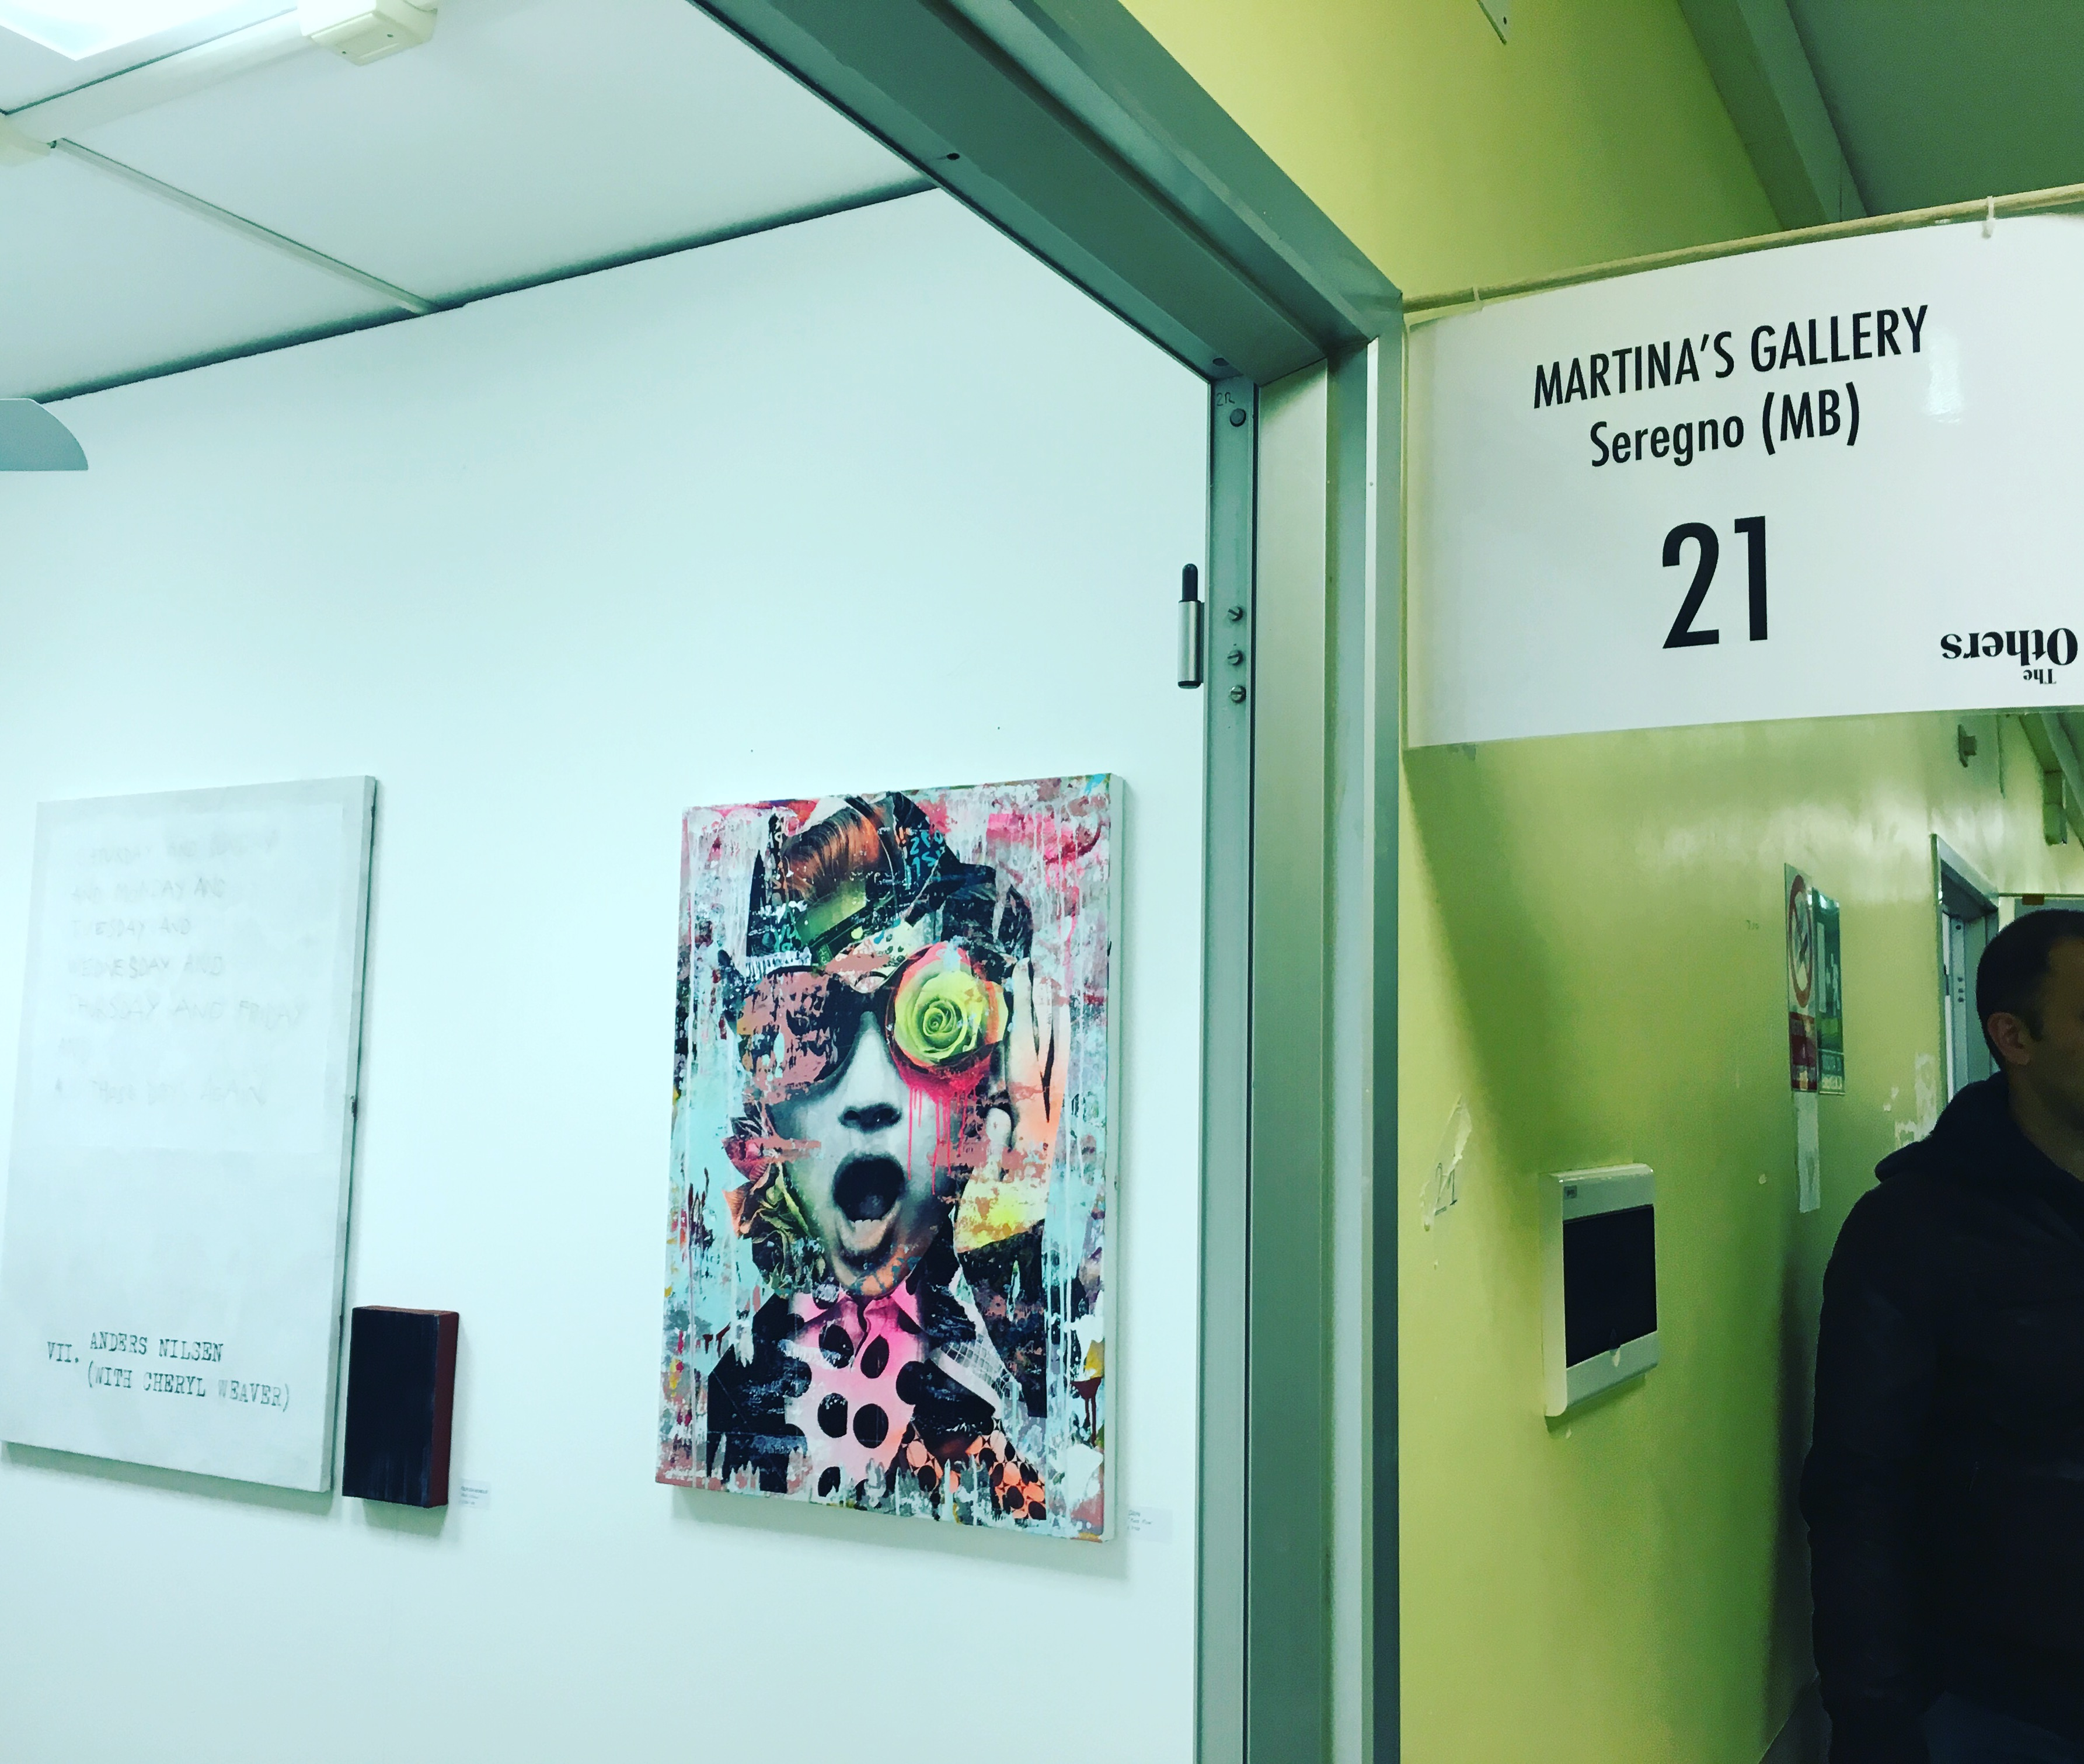 Martina's Gallery